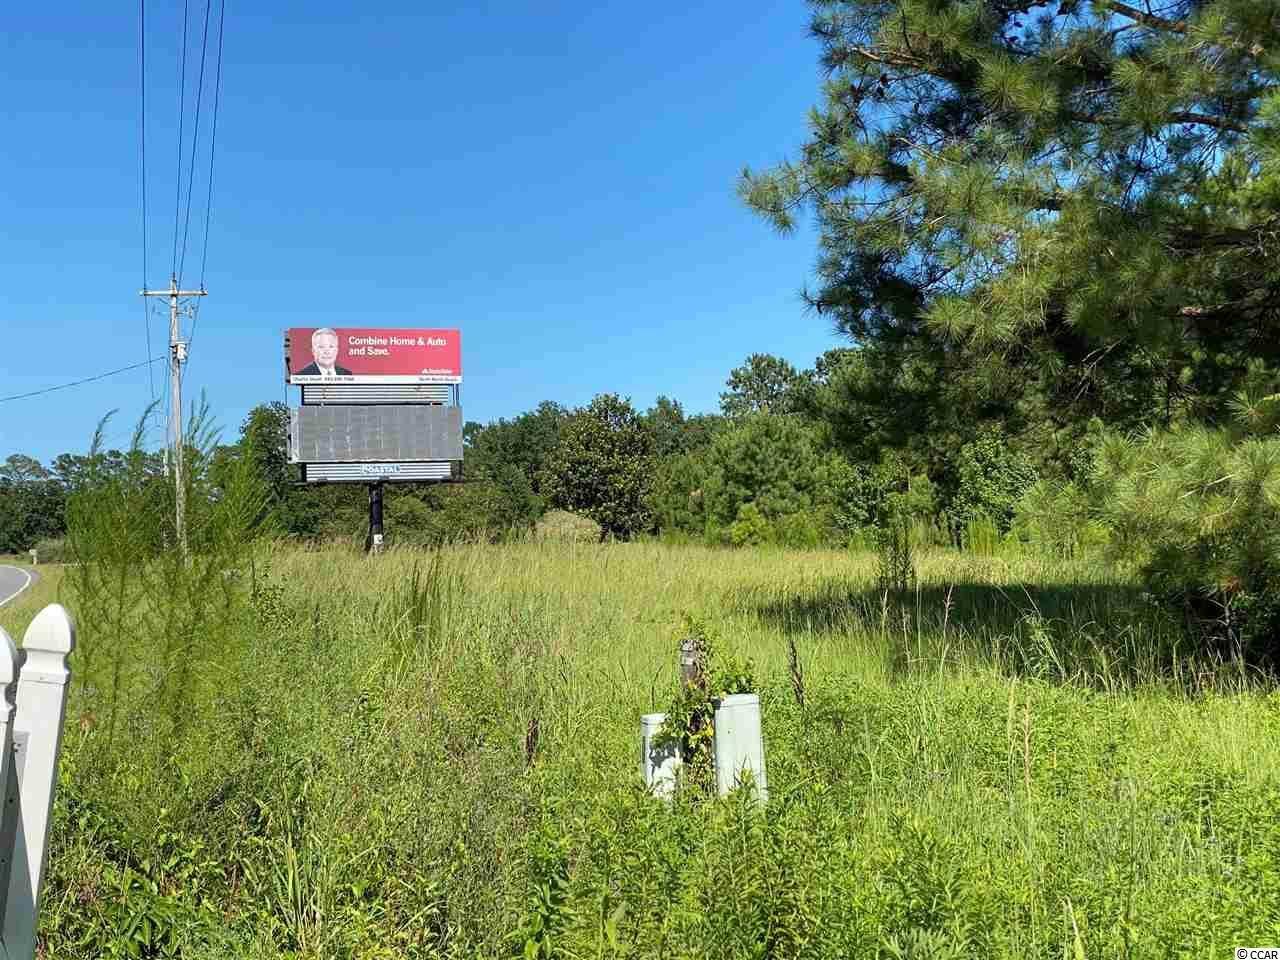 TBD Highway 905 - Photo 1